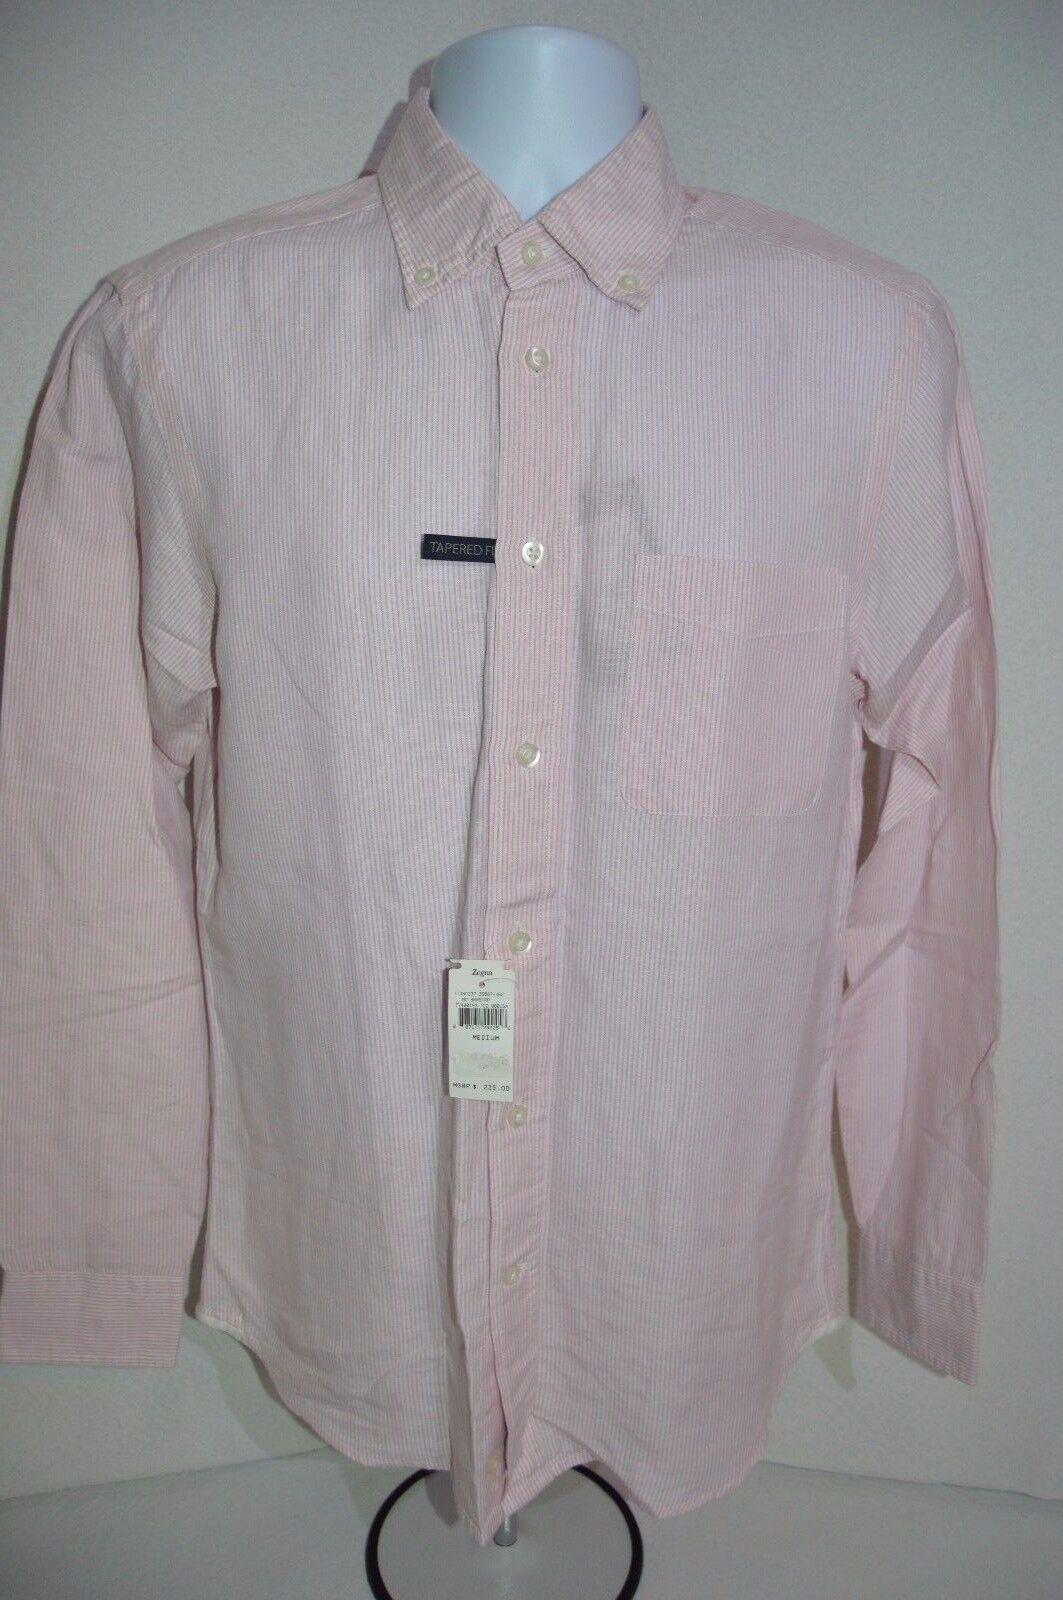 ERMENEGILDO ZEGNA SPORT Man's Casual Tapered Shirt NEW Size Medium Retail